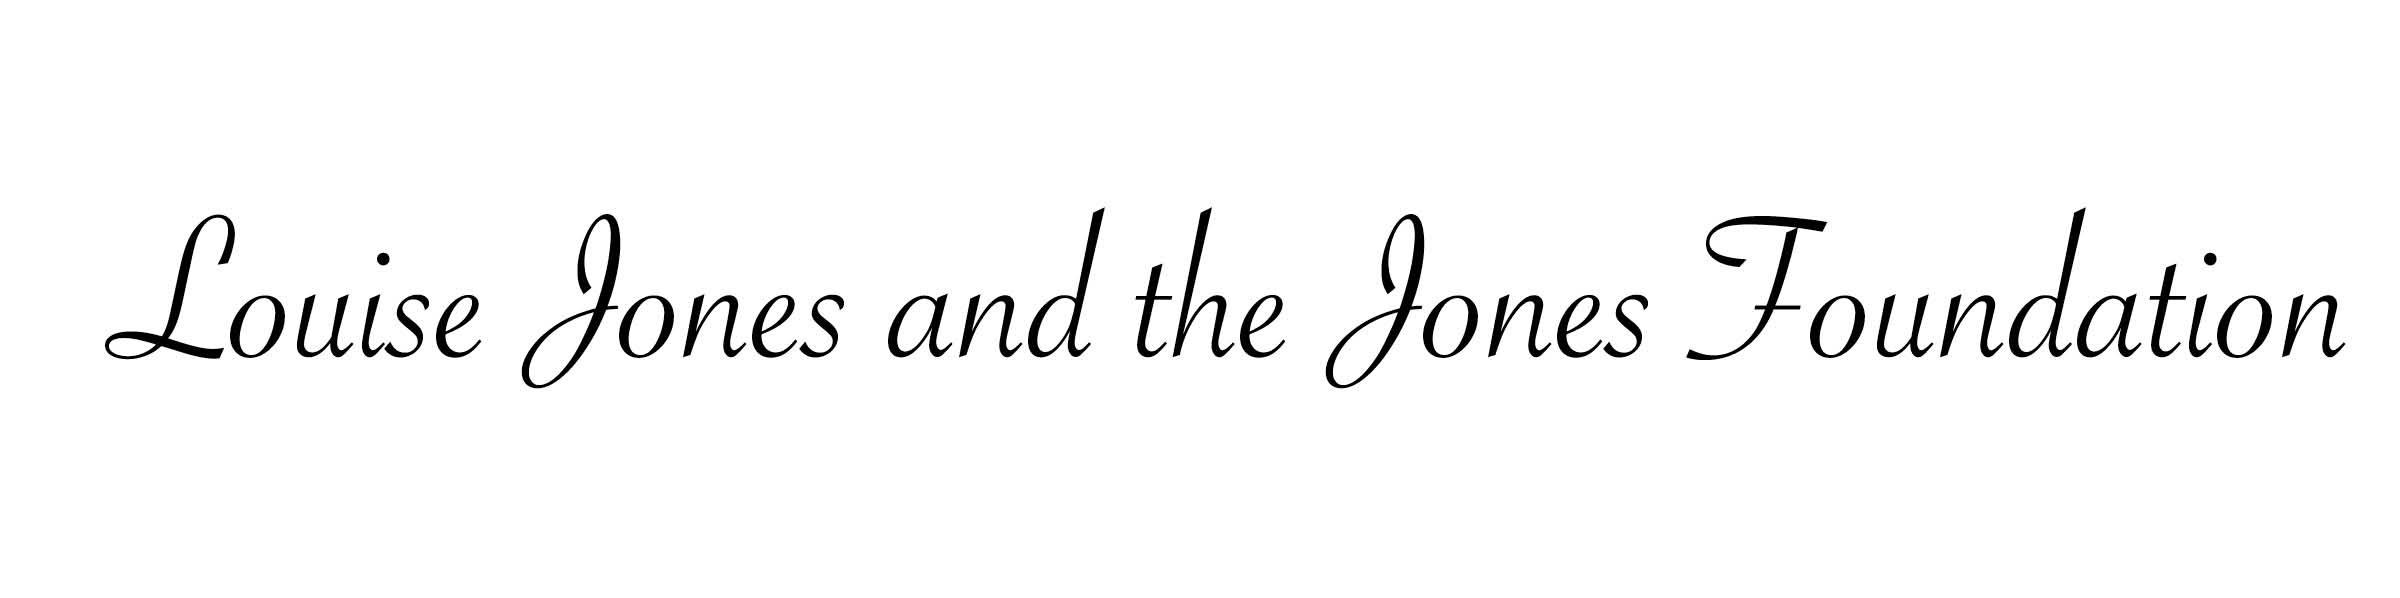 Louise Jones and the Jones Foundation